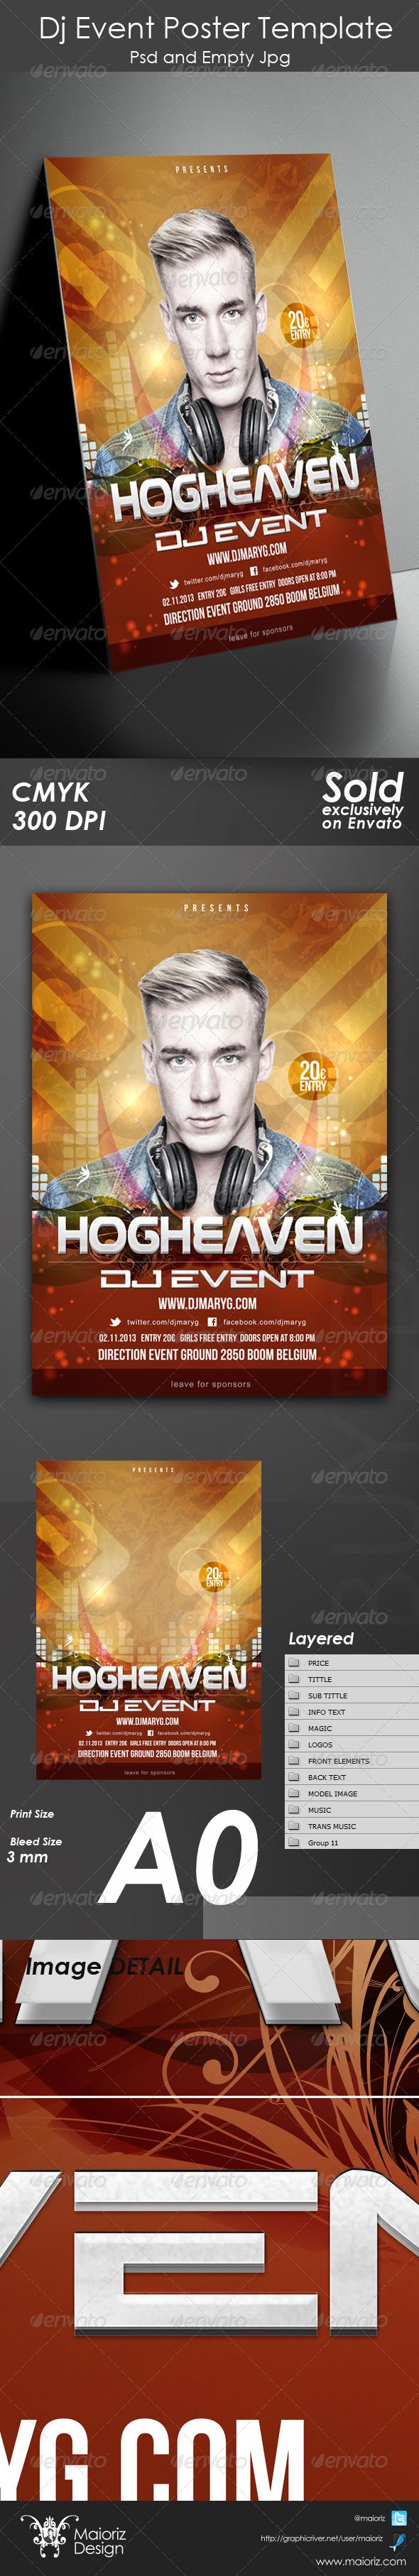 GraphicRiver Dj Event Poster Template 5576994